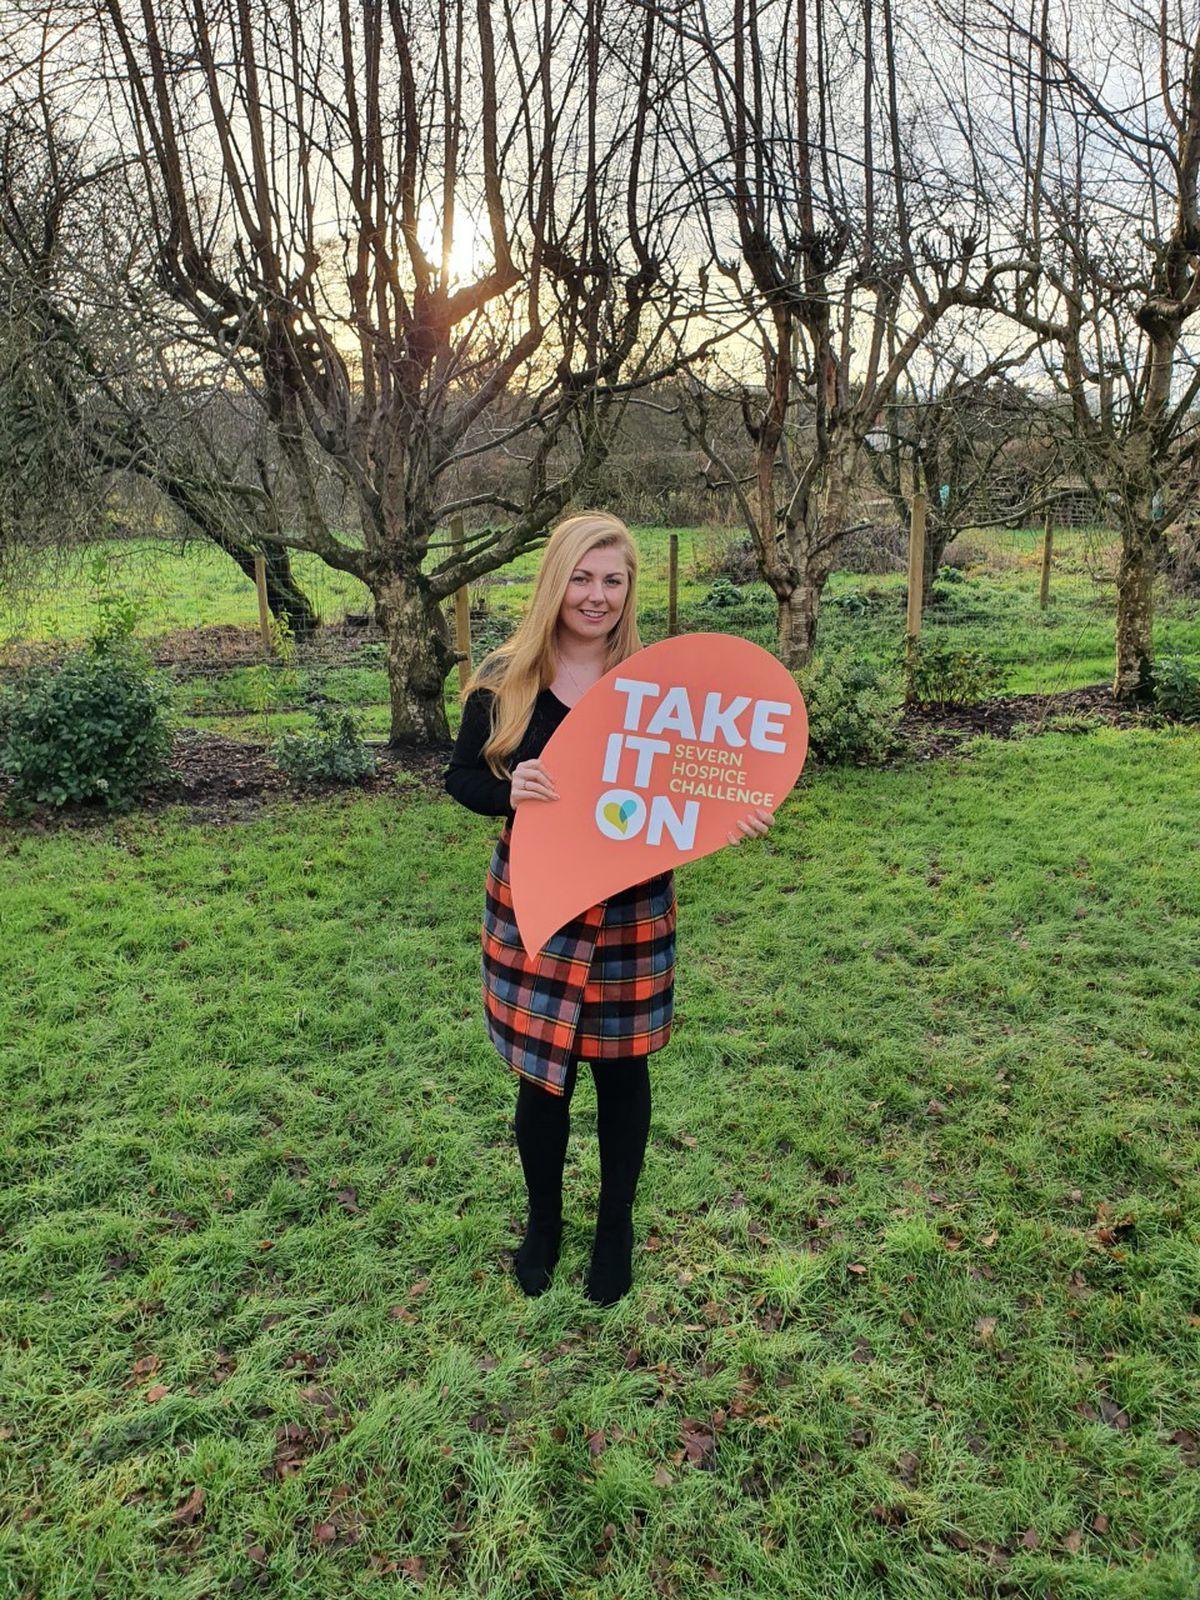 Jess Druce, area fundraiser for Severn Hospice